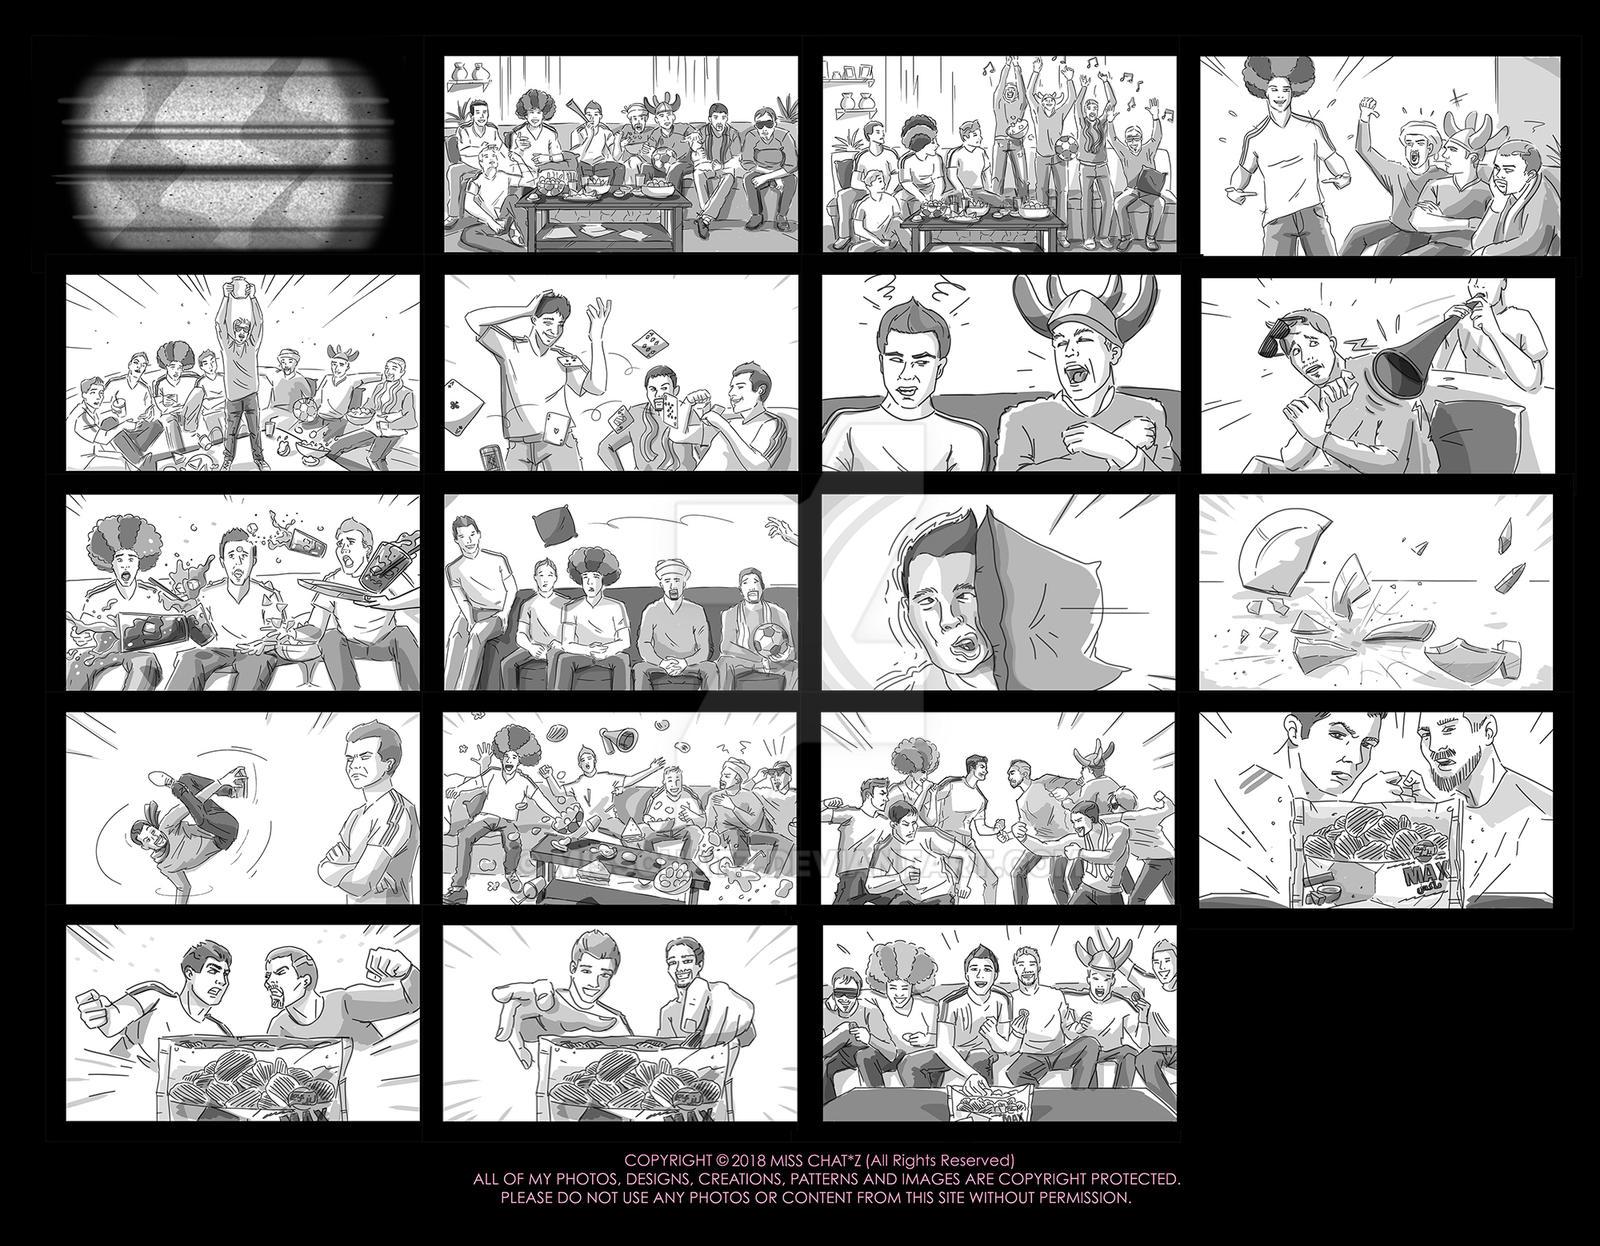 LAYS Share Storyboard by MissChatZ